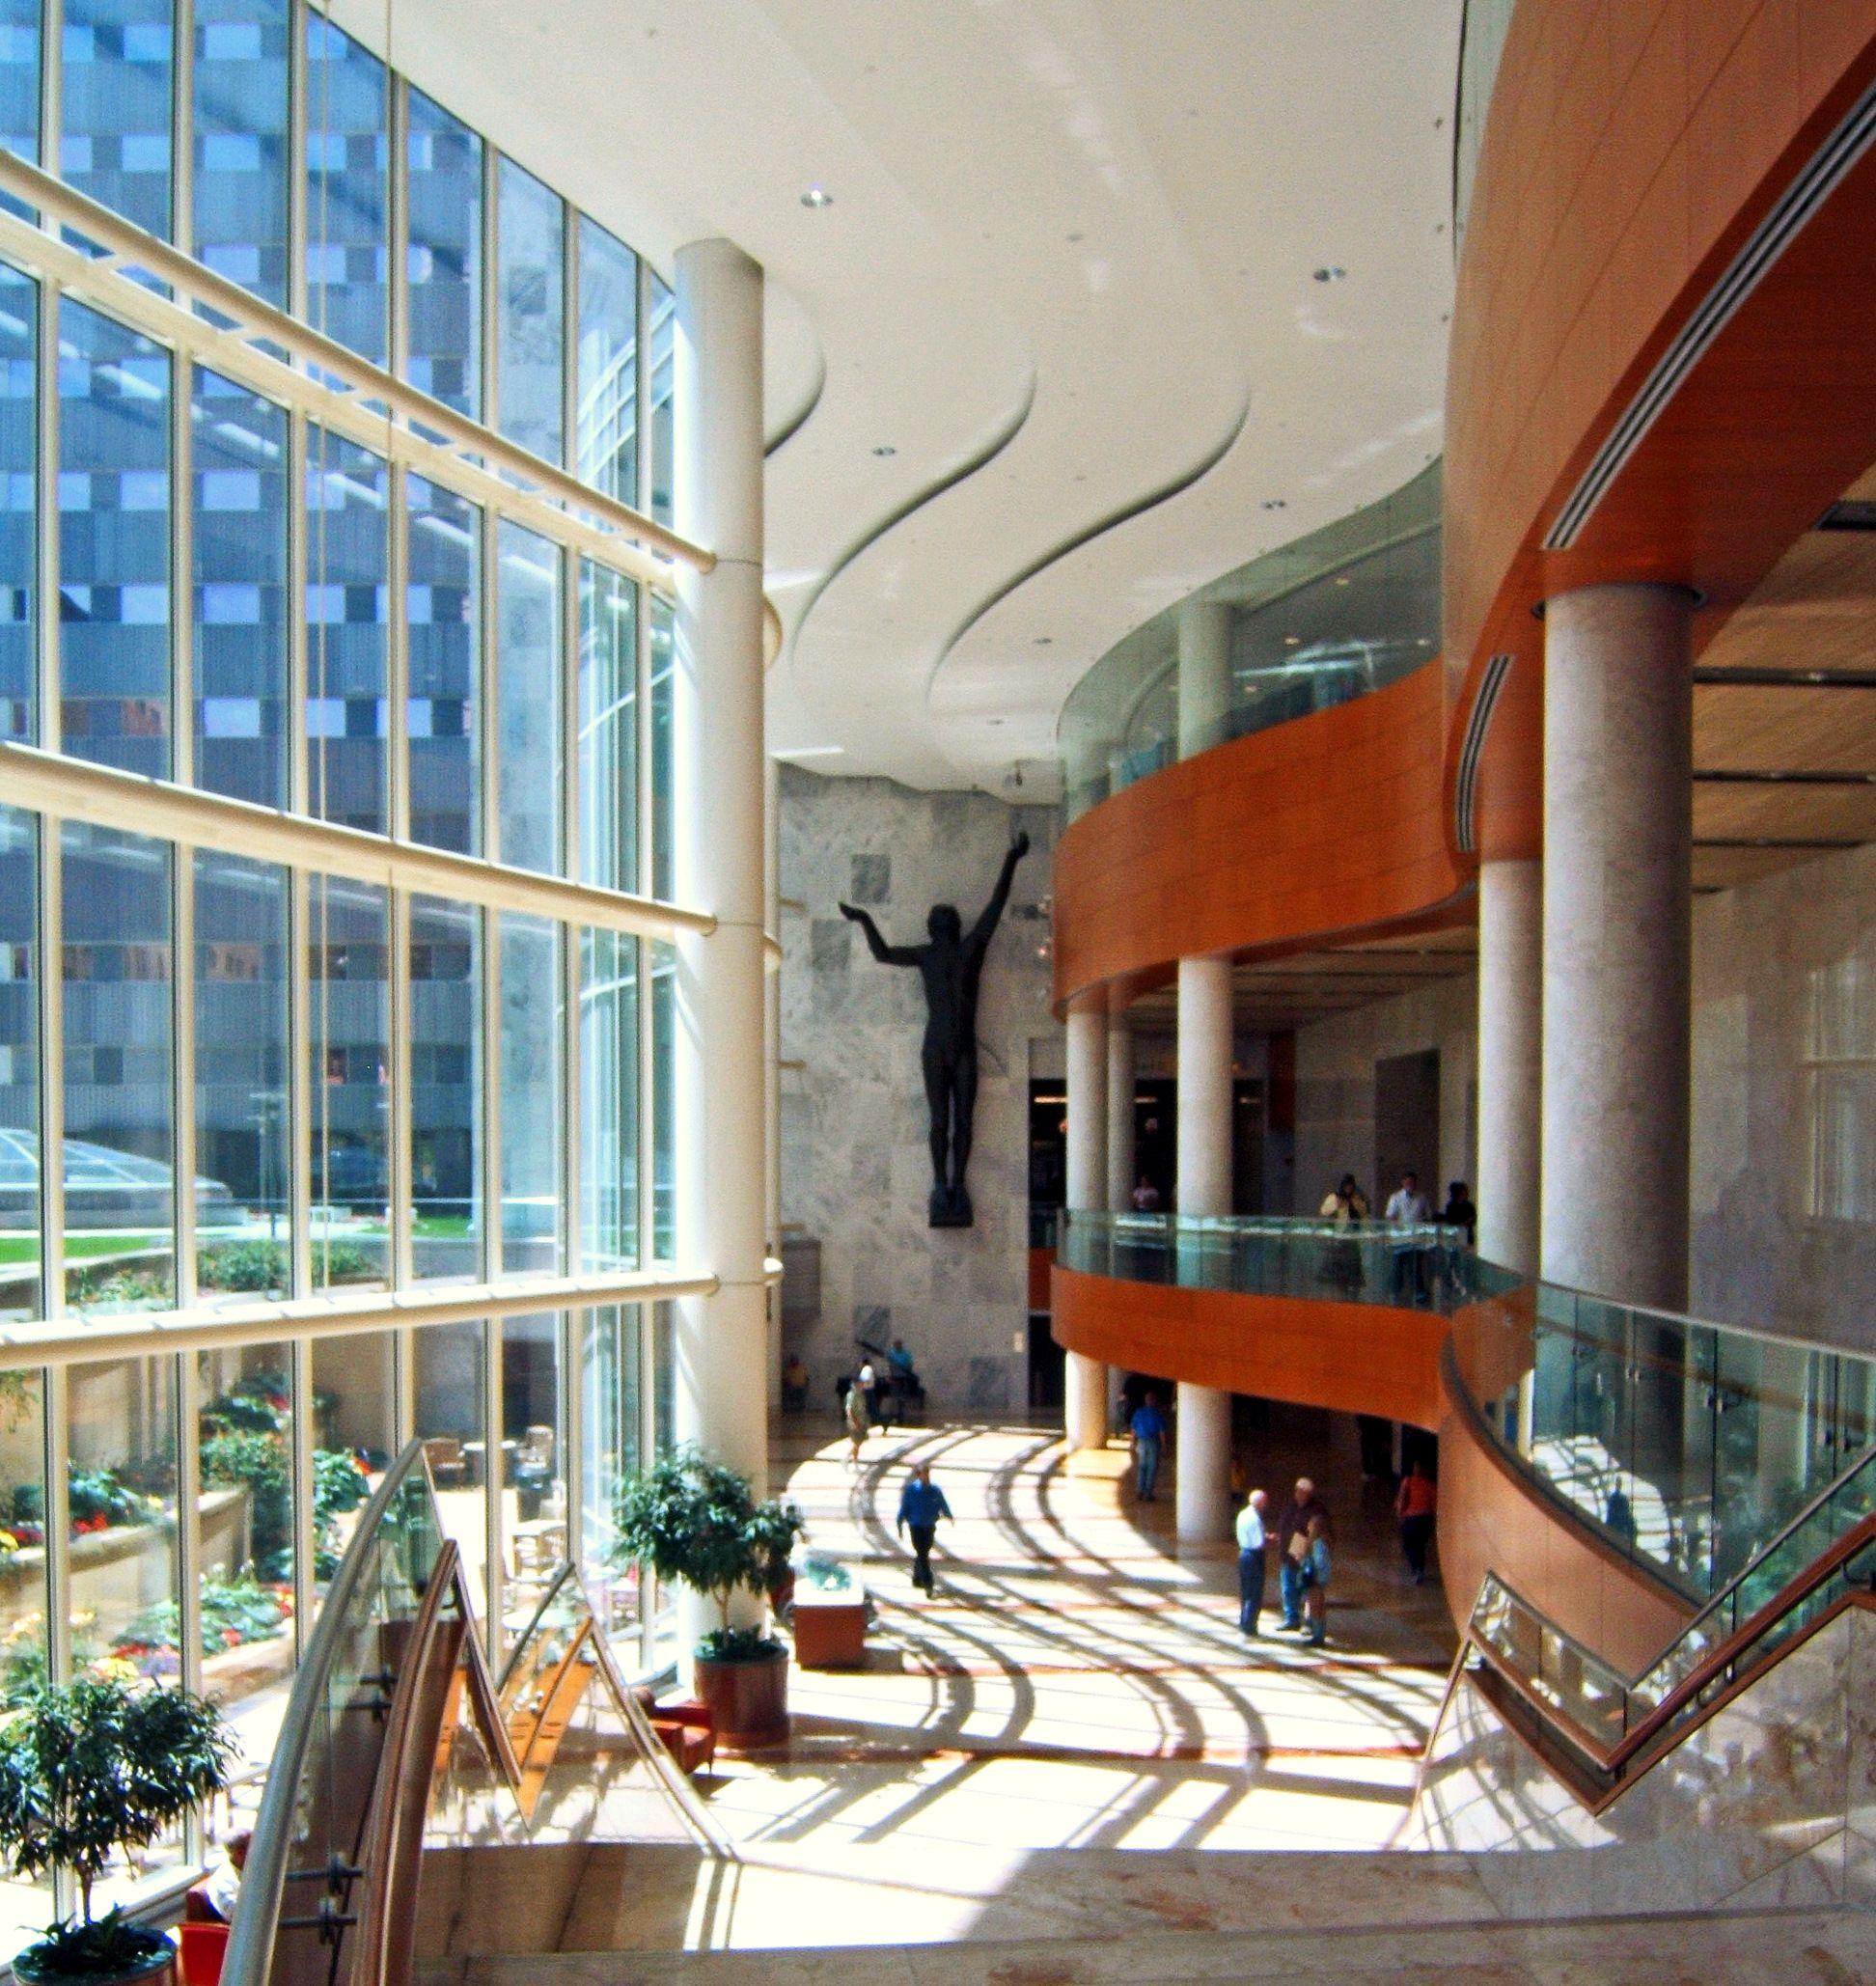 The Mayo Clinic Gonda Builiding Rochester, Minnesota